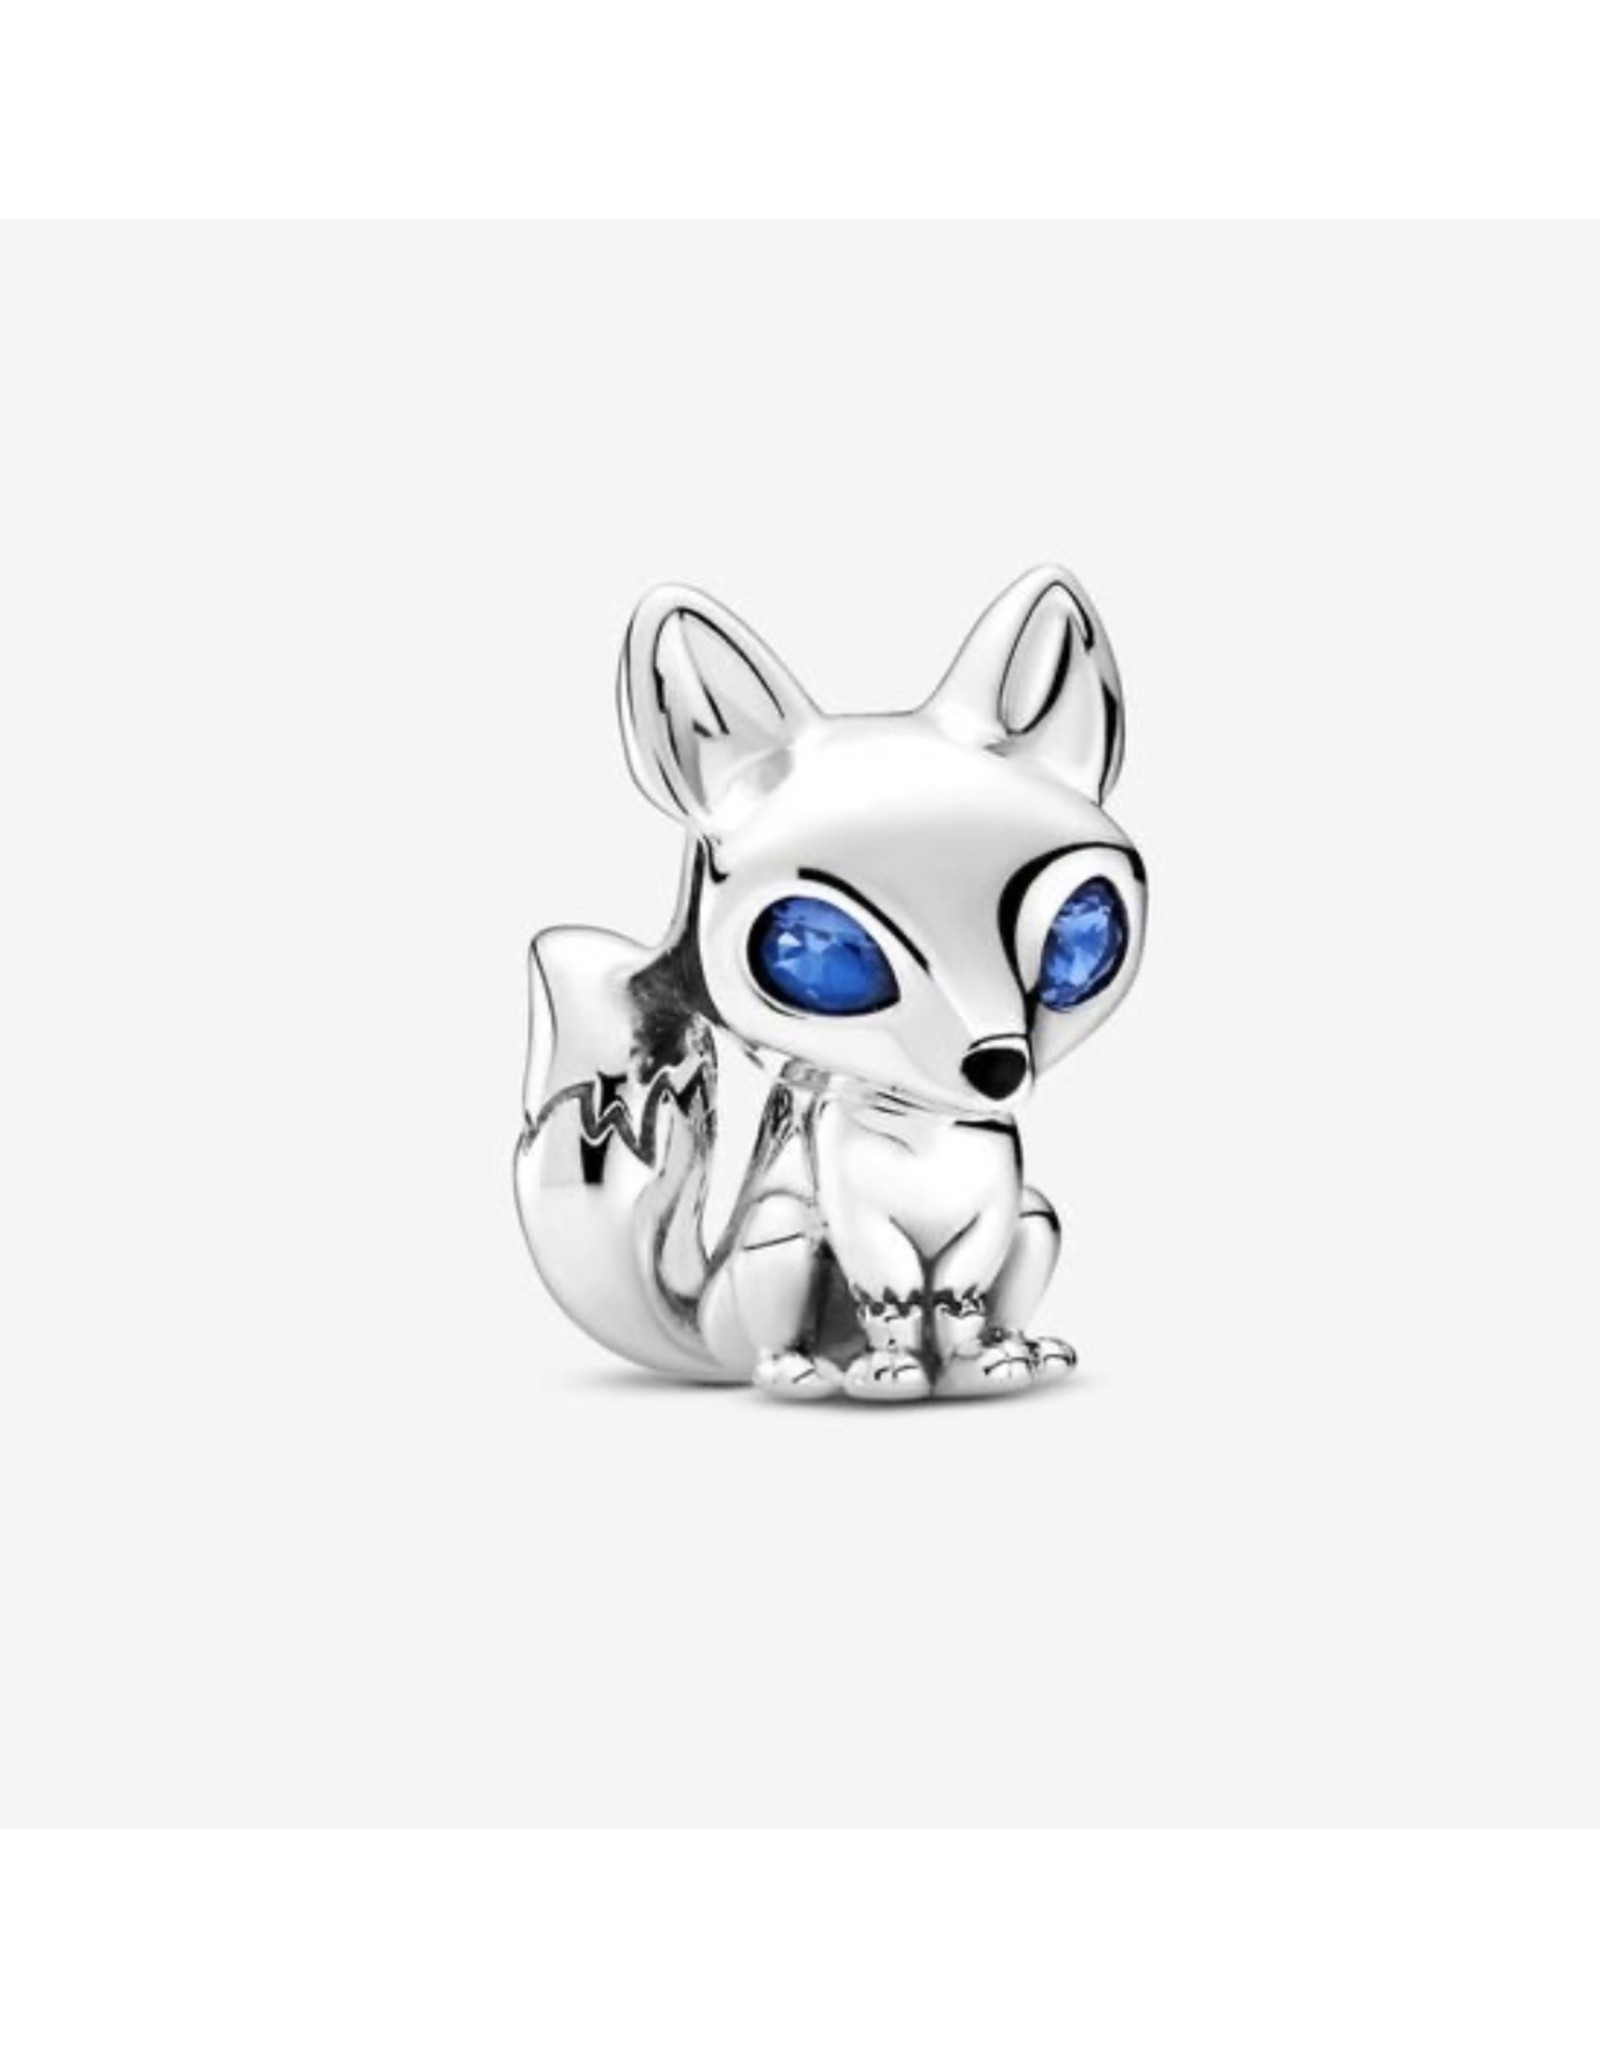 Pandora Pandora Charm,799096C01, Blue-Eyed Fox, Blue Crystals&Black Enamel, Sterling Silver